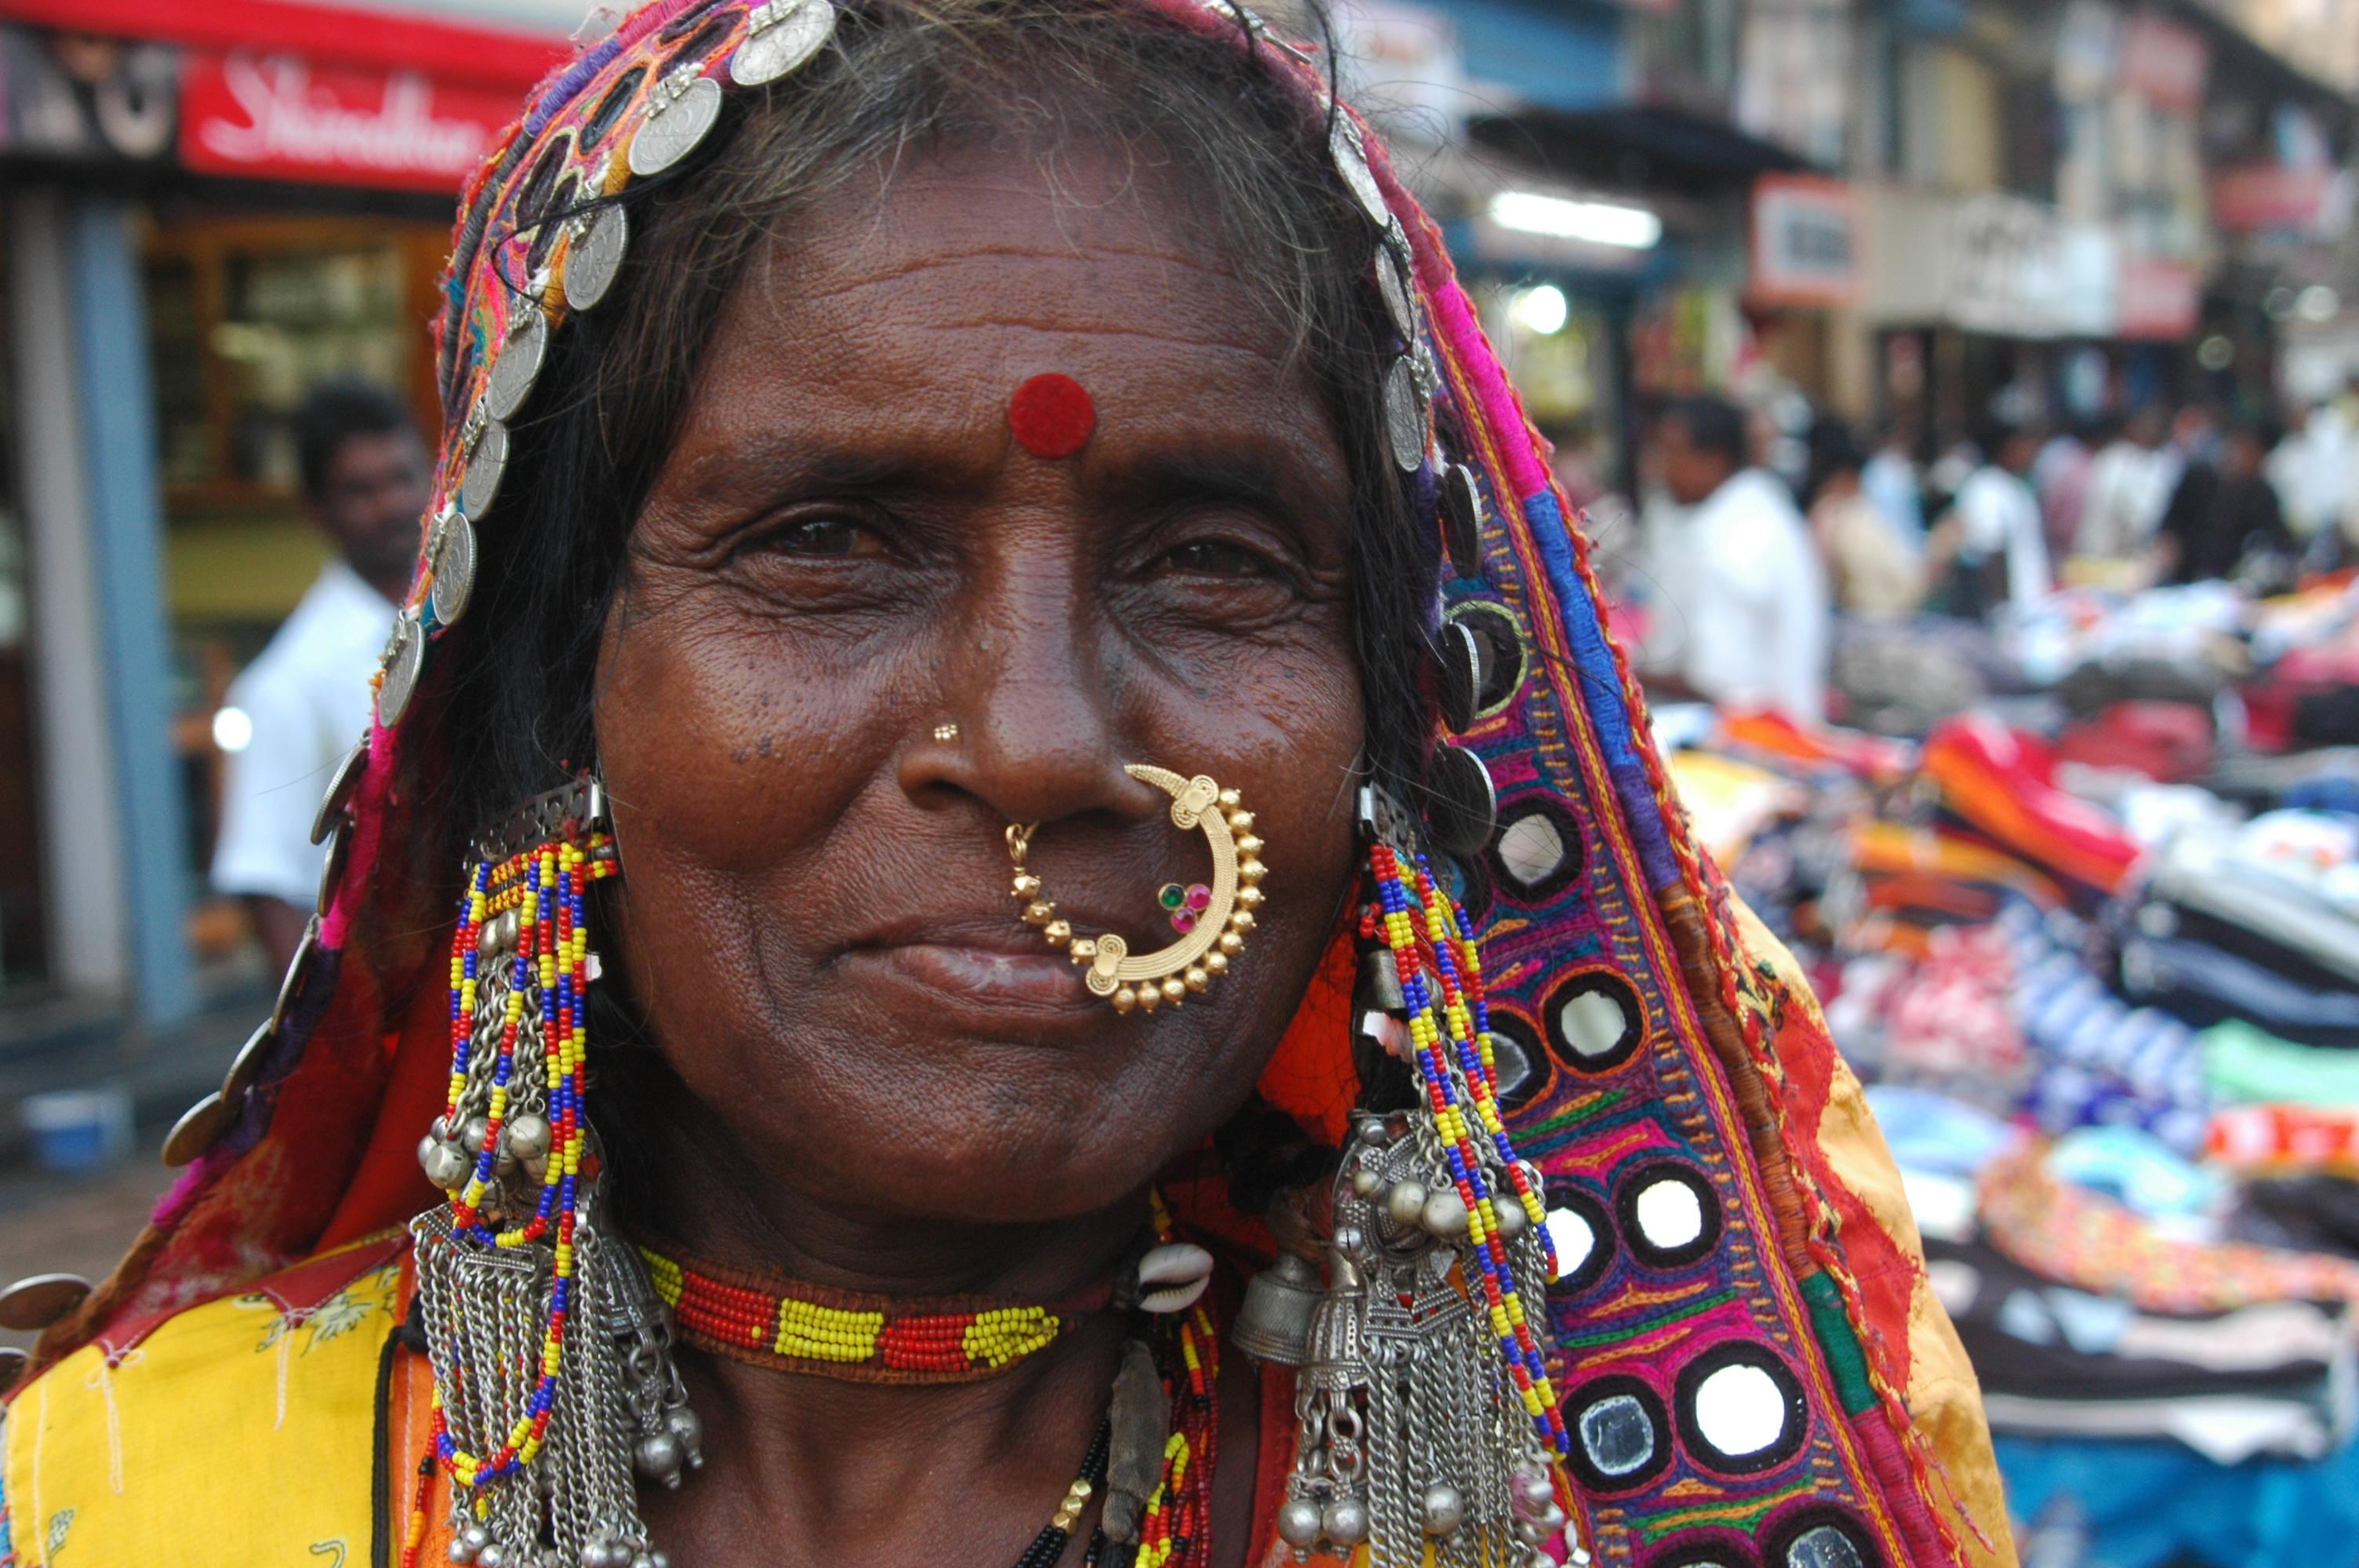 The Lambada from Deccan, Goa, India